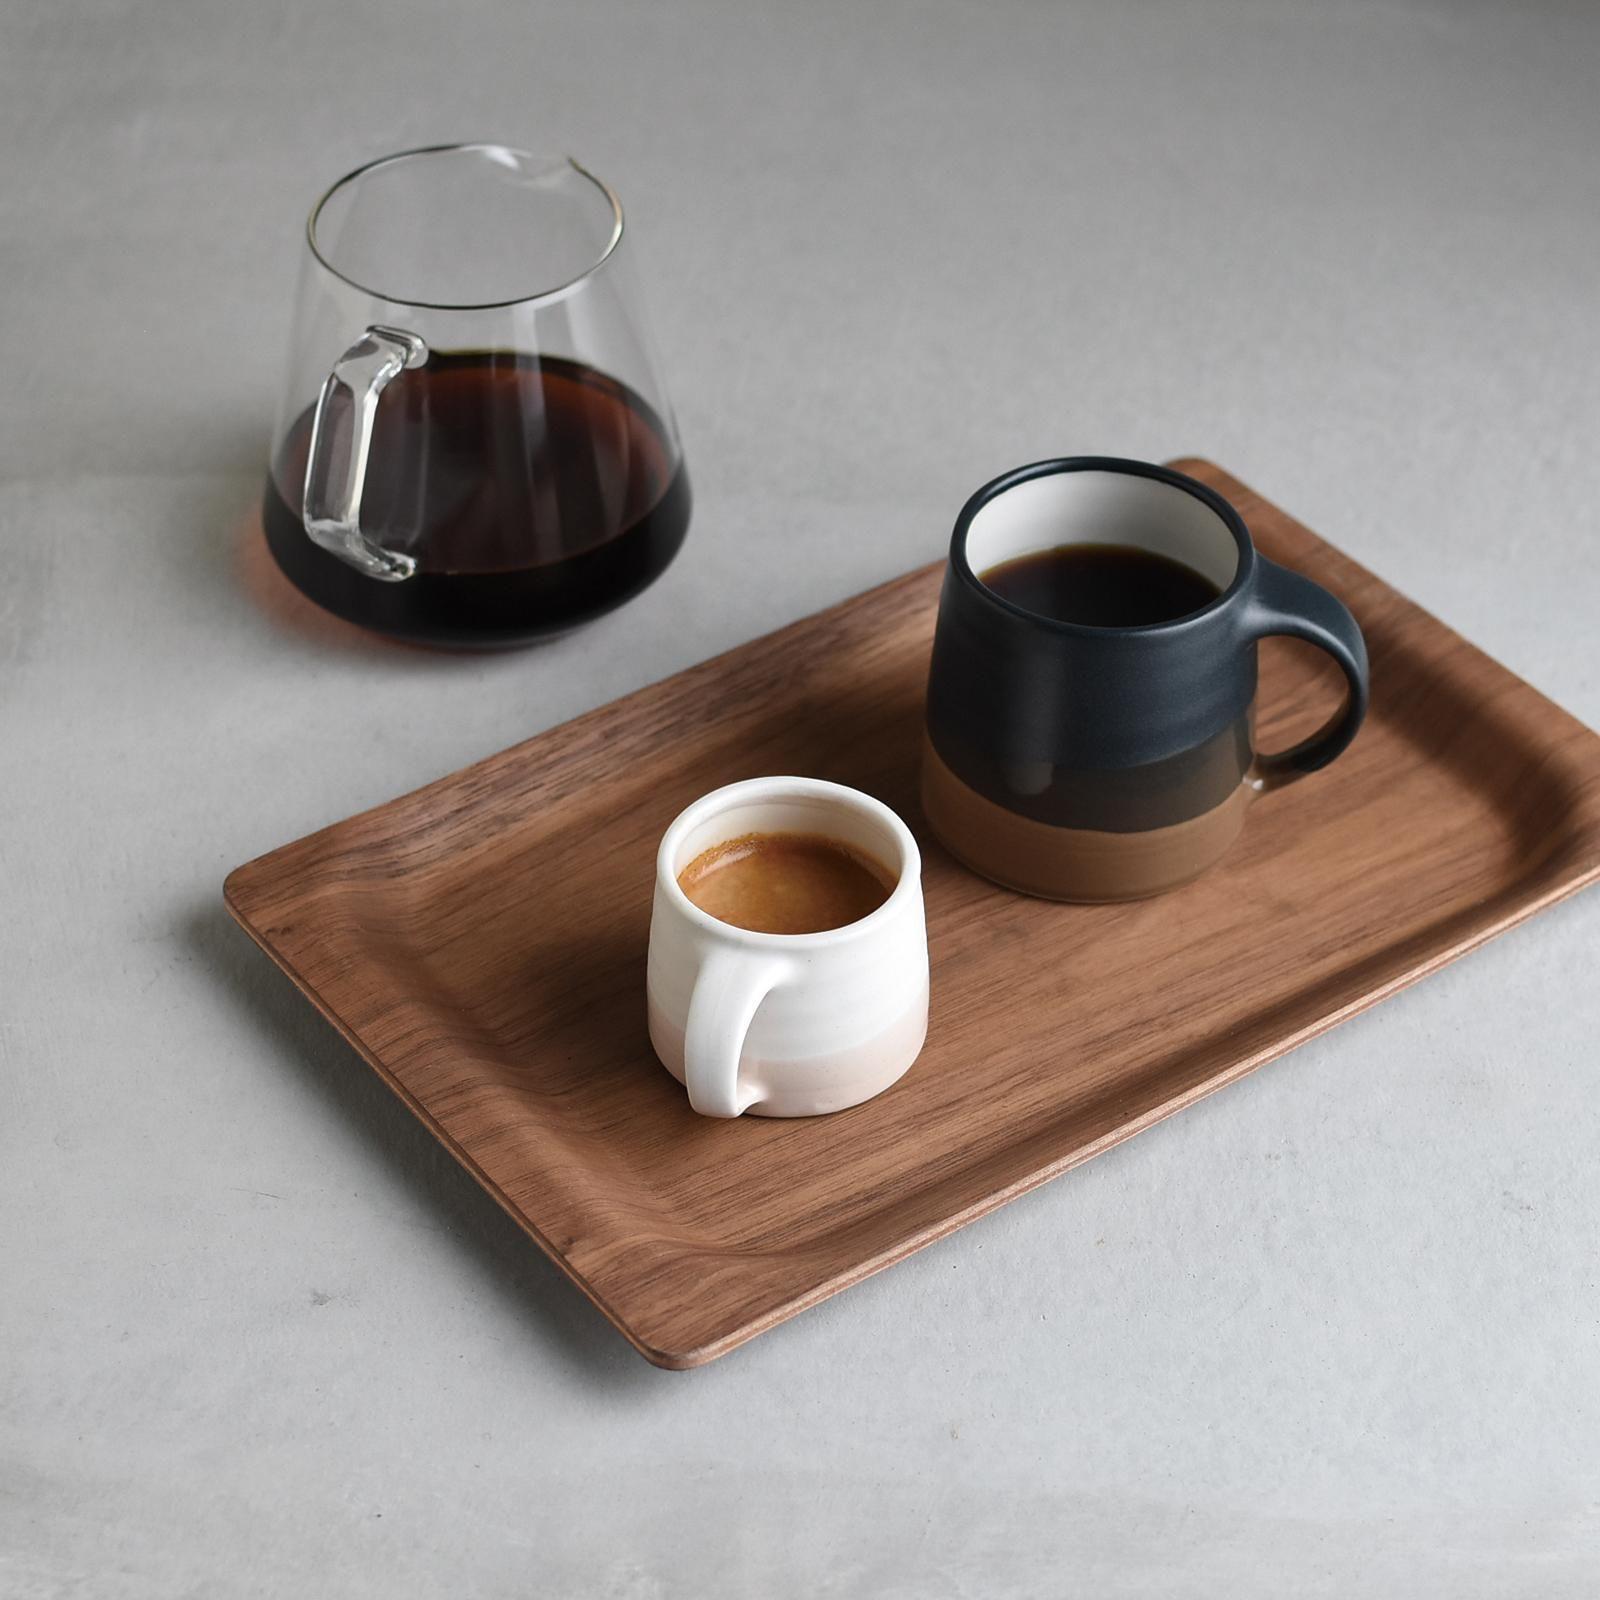 Kinto Scs S03 Mug White Pink Beige In 2021 Cold Coffee Recipes Coffee Recipes Coffee Recipes Hot [ 1600 x 1600 Pixel ]